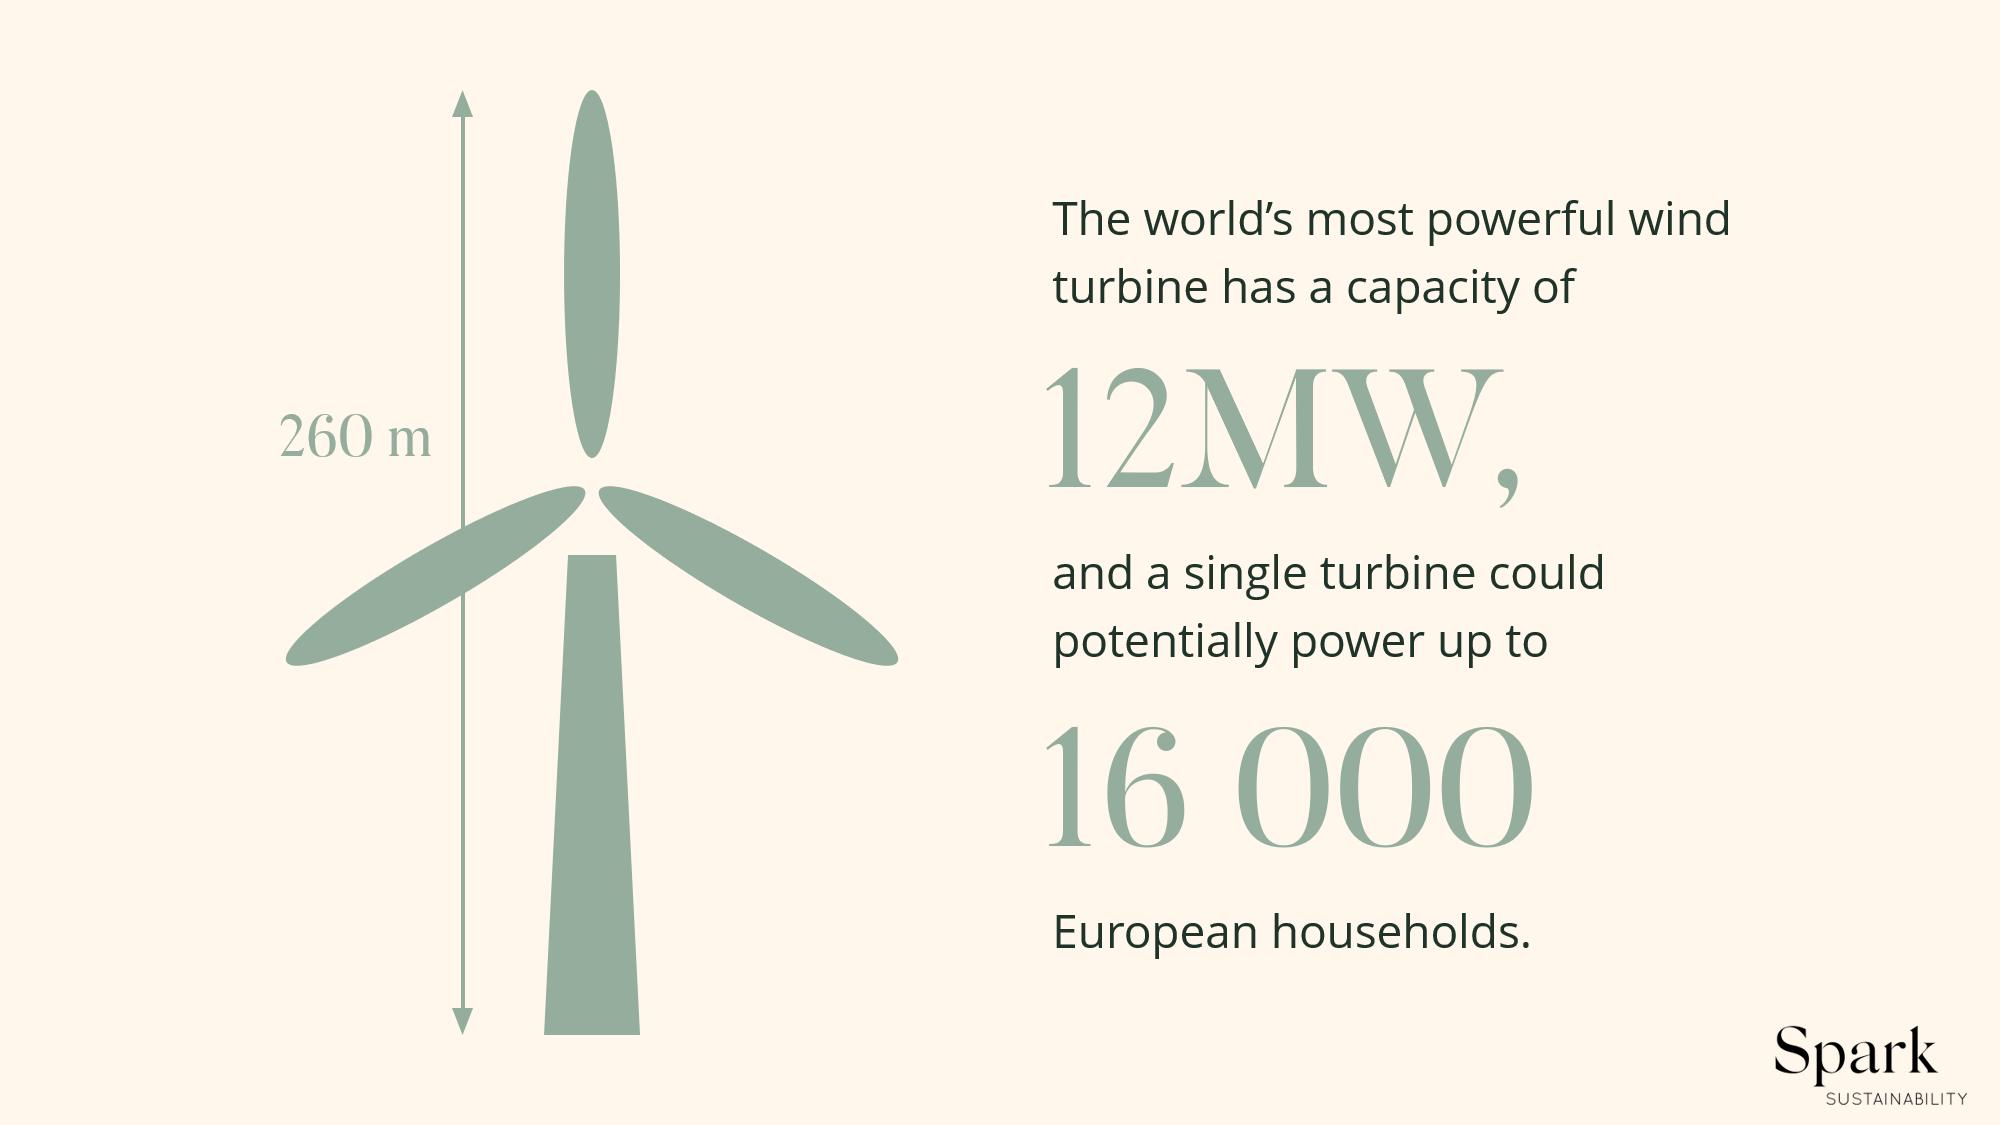 The world's most powerful wind turbine.